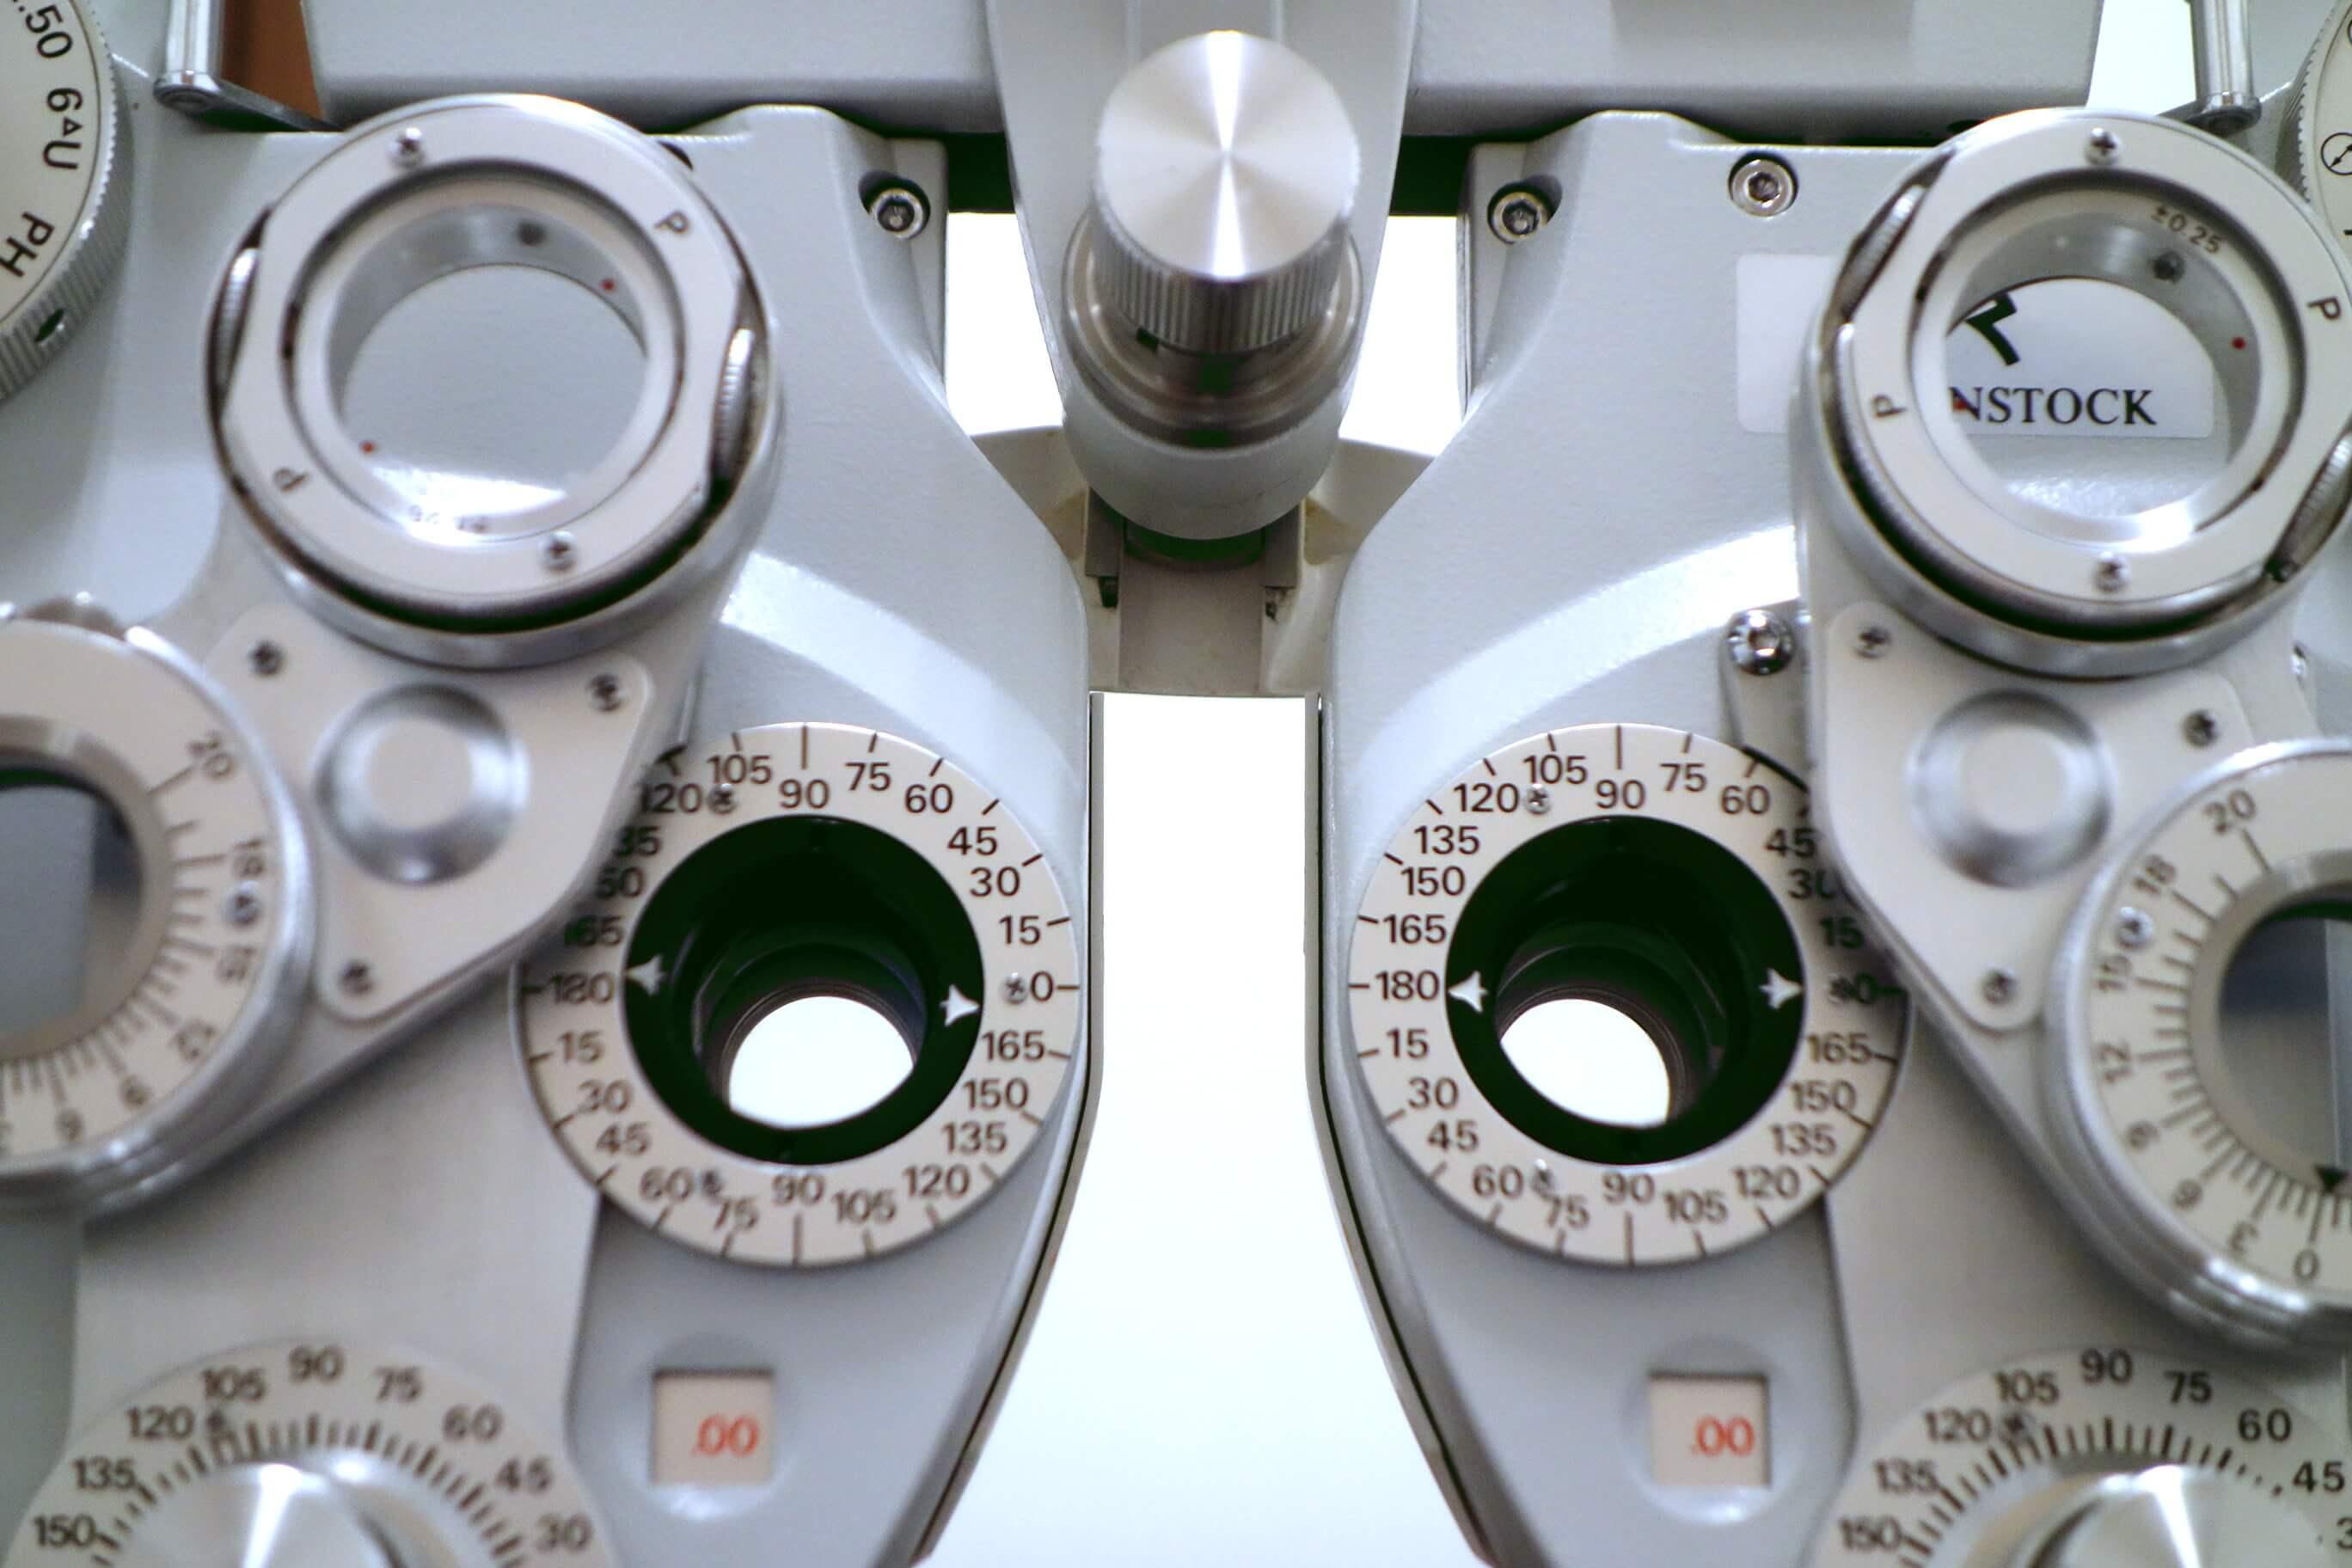 Messgerät um beim Augenarzt Sehstärke festzustellen